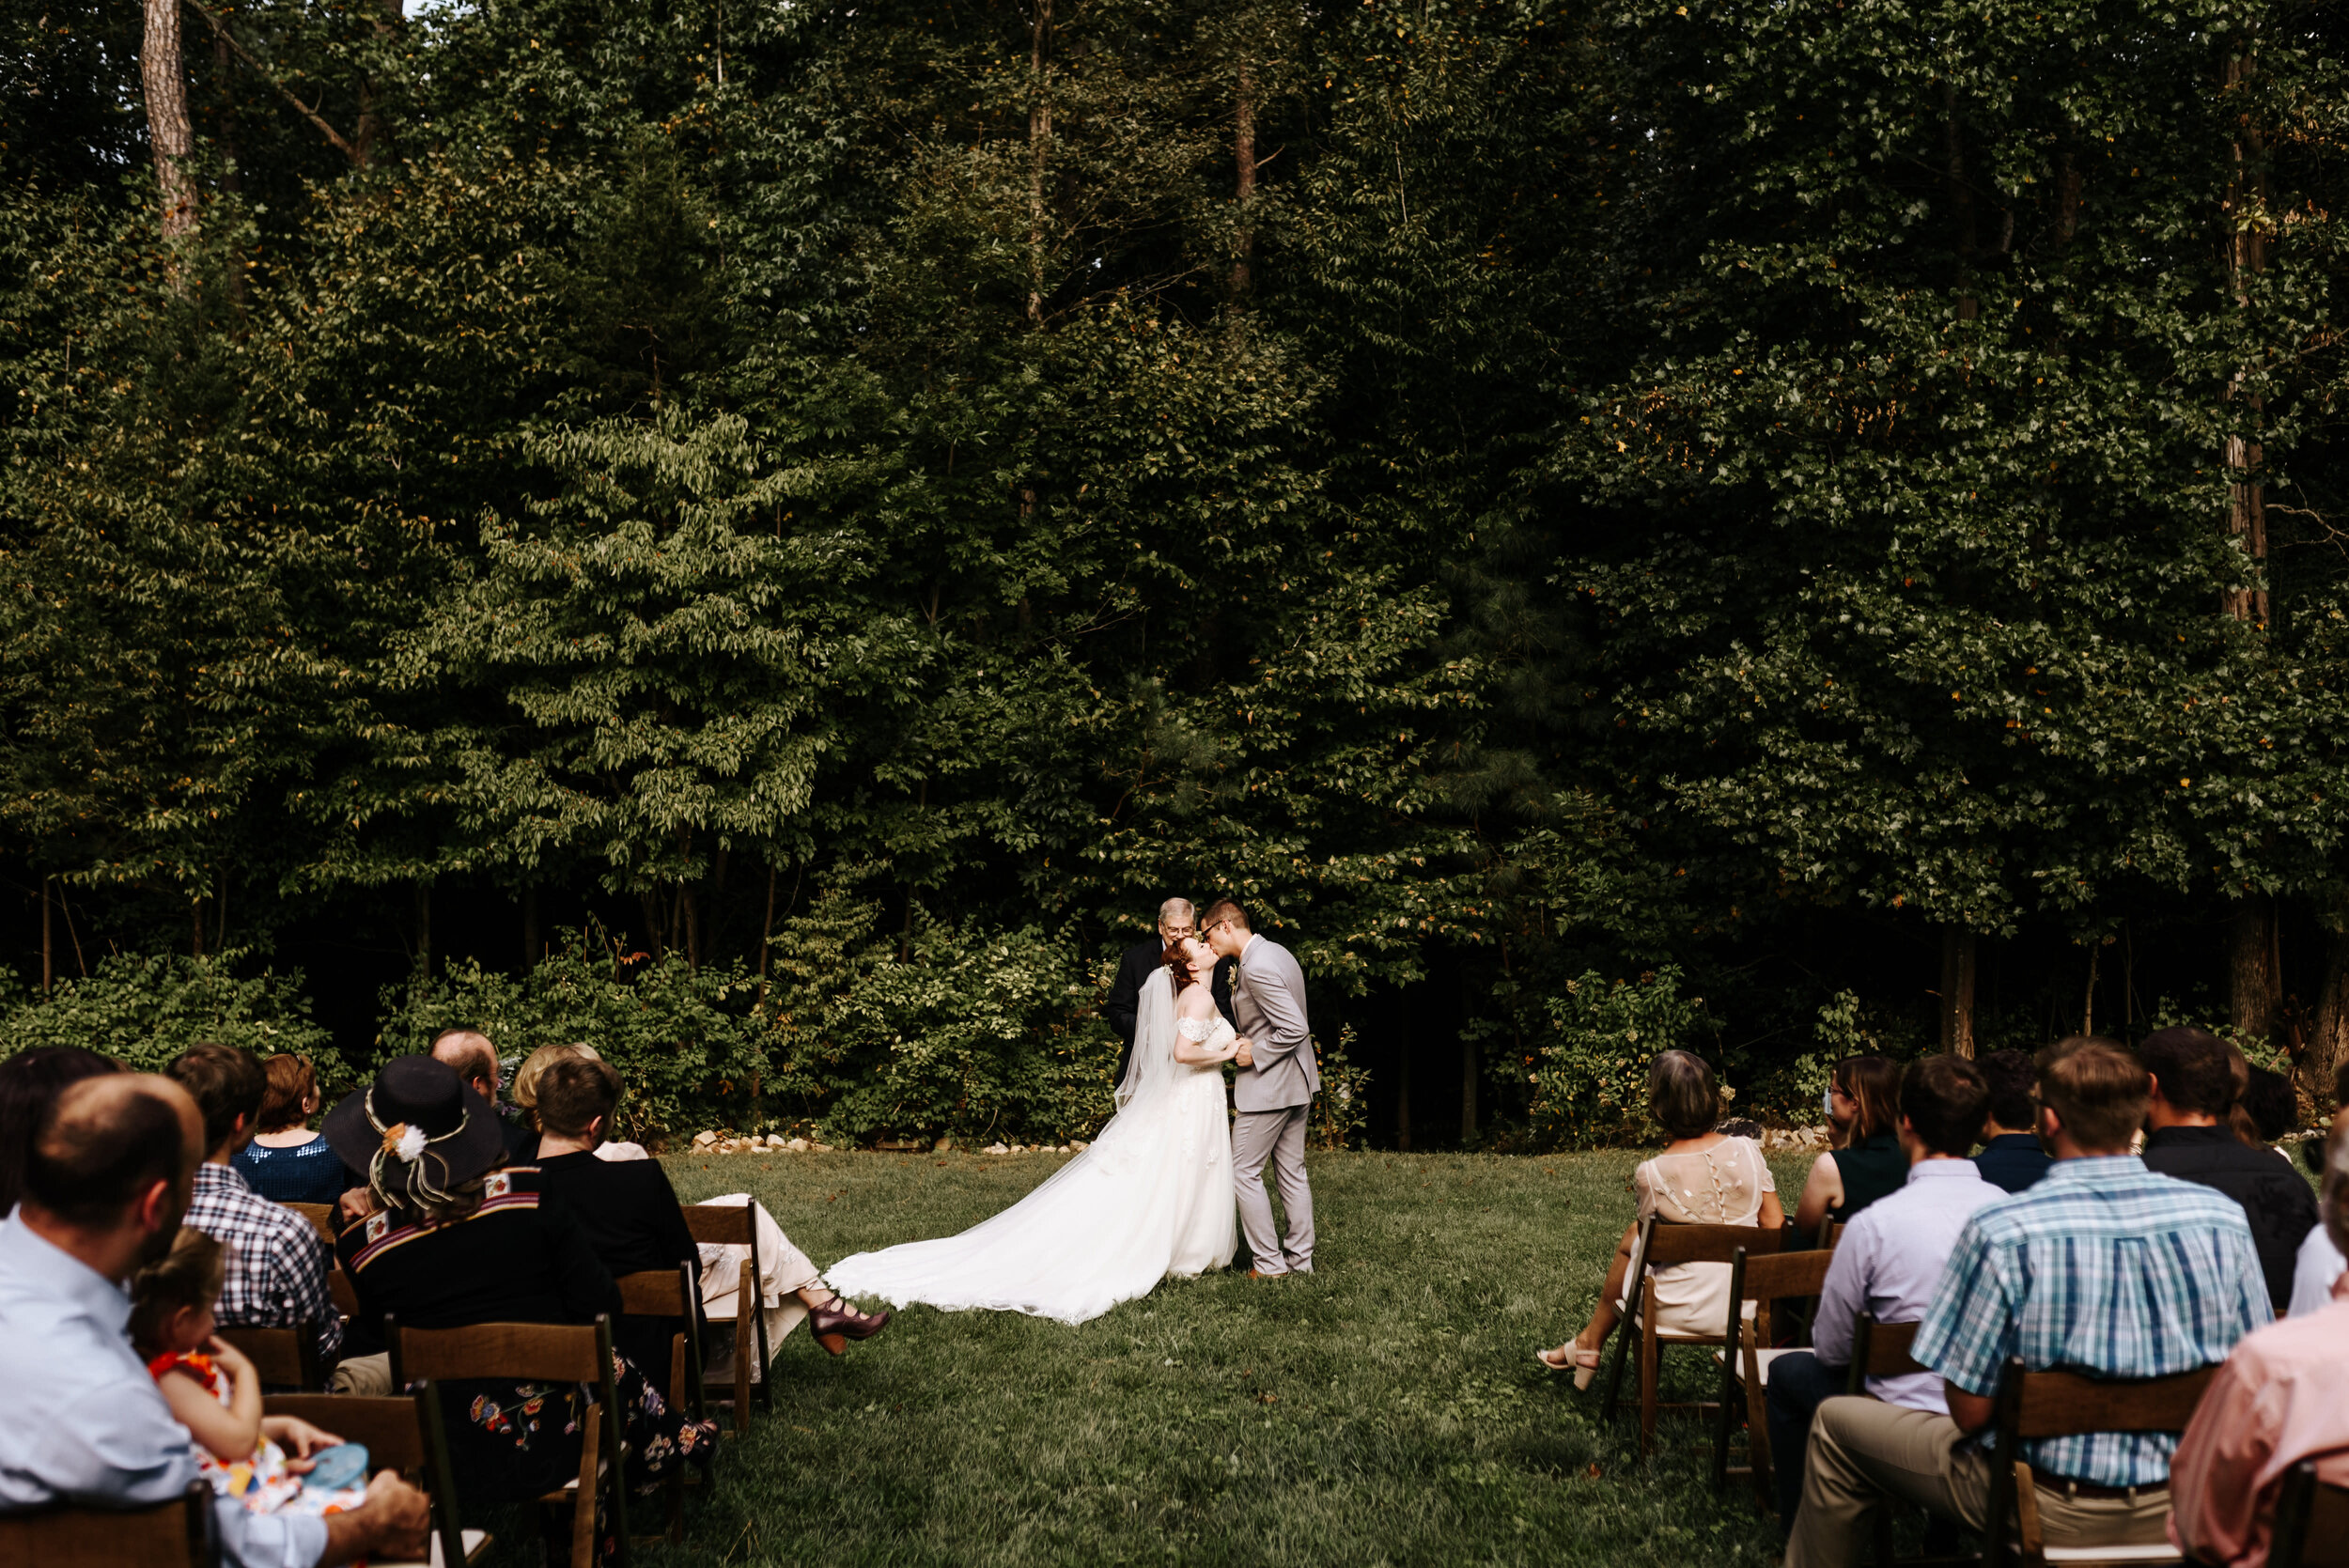 Rachel_David_Wedding_Richmond_Virginia_Photography_by_V_26.jpg